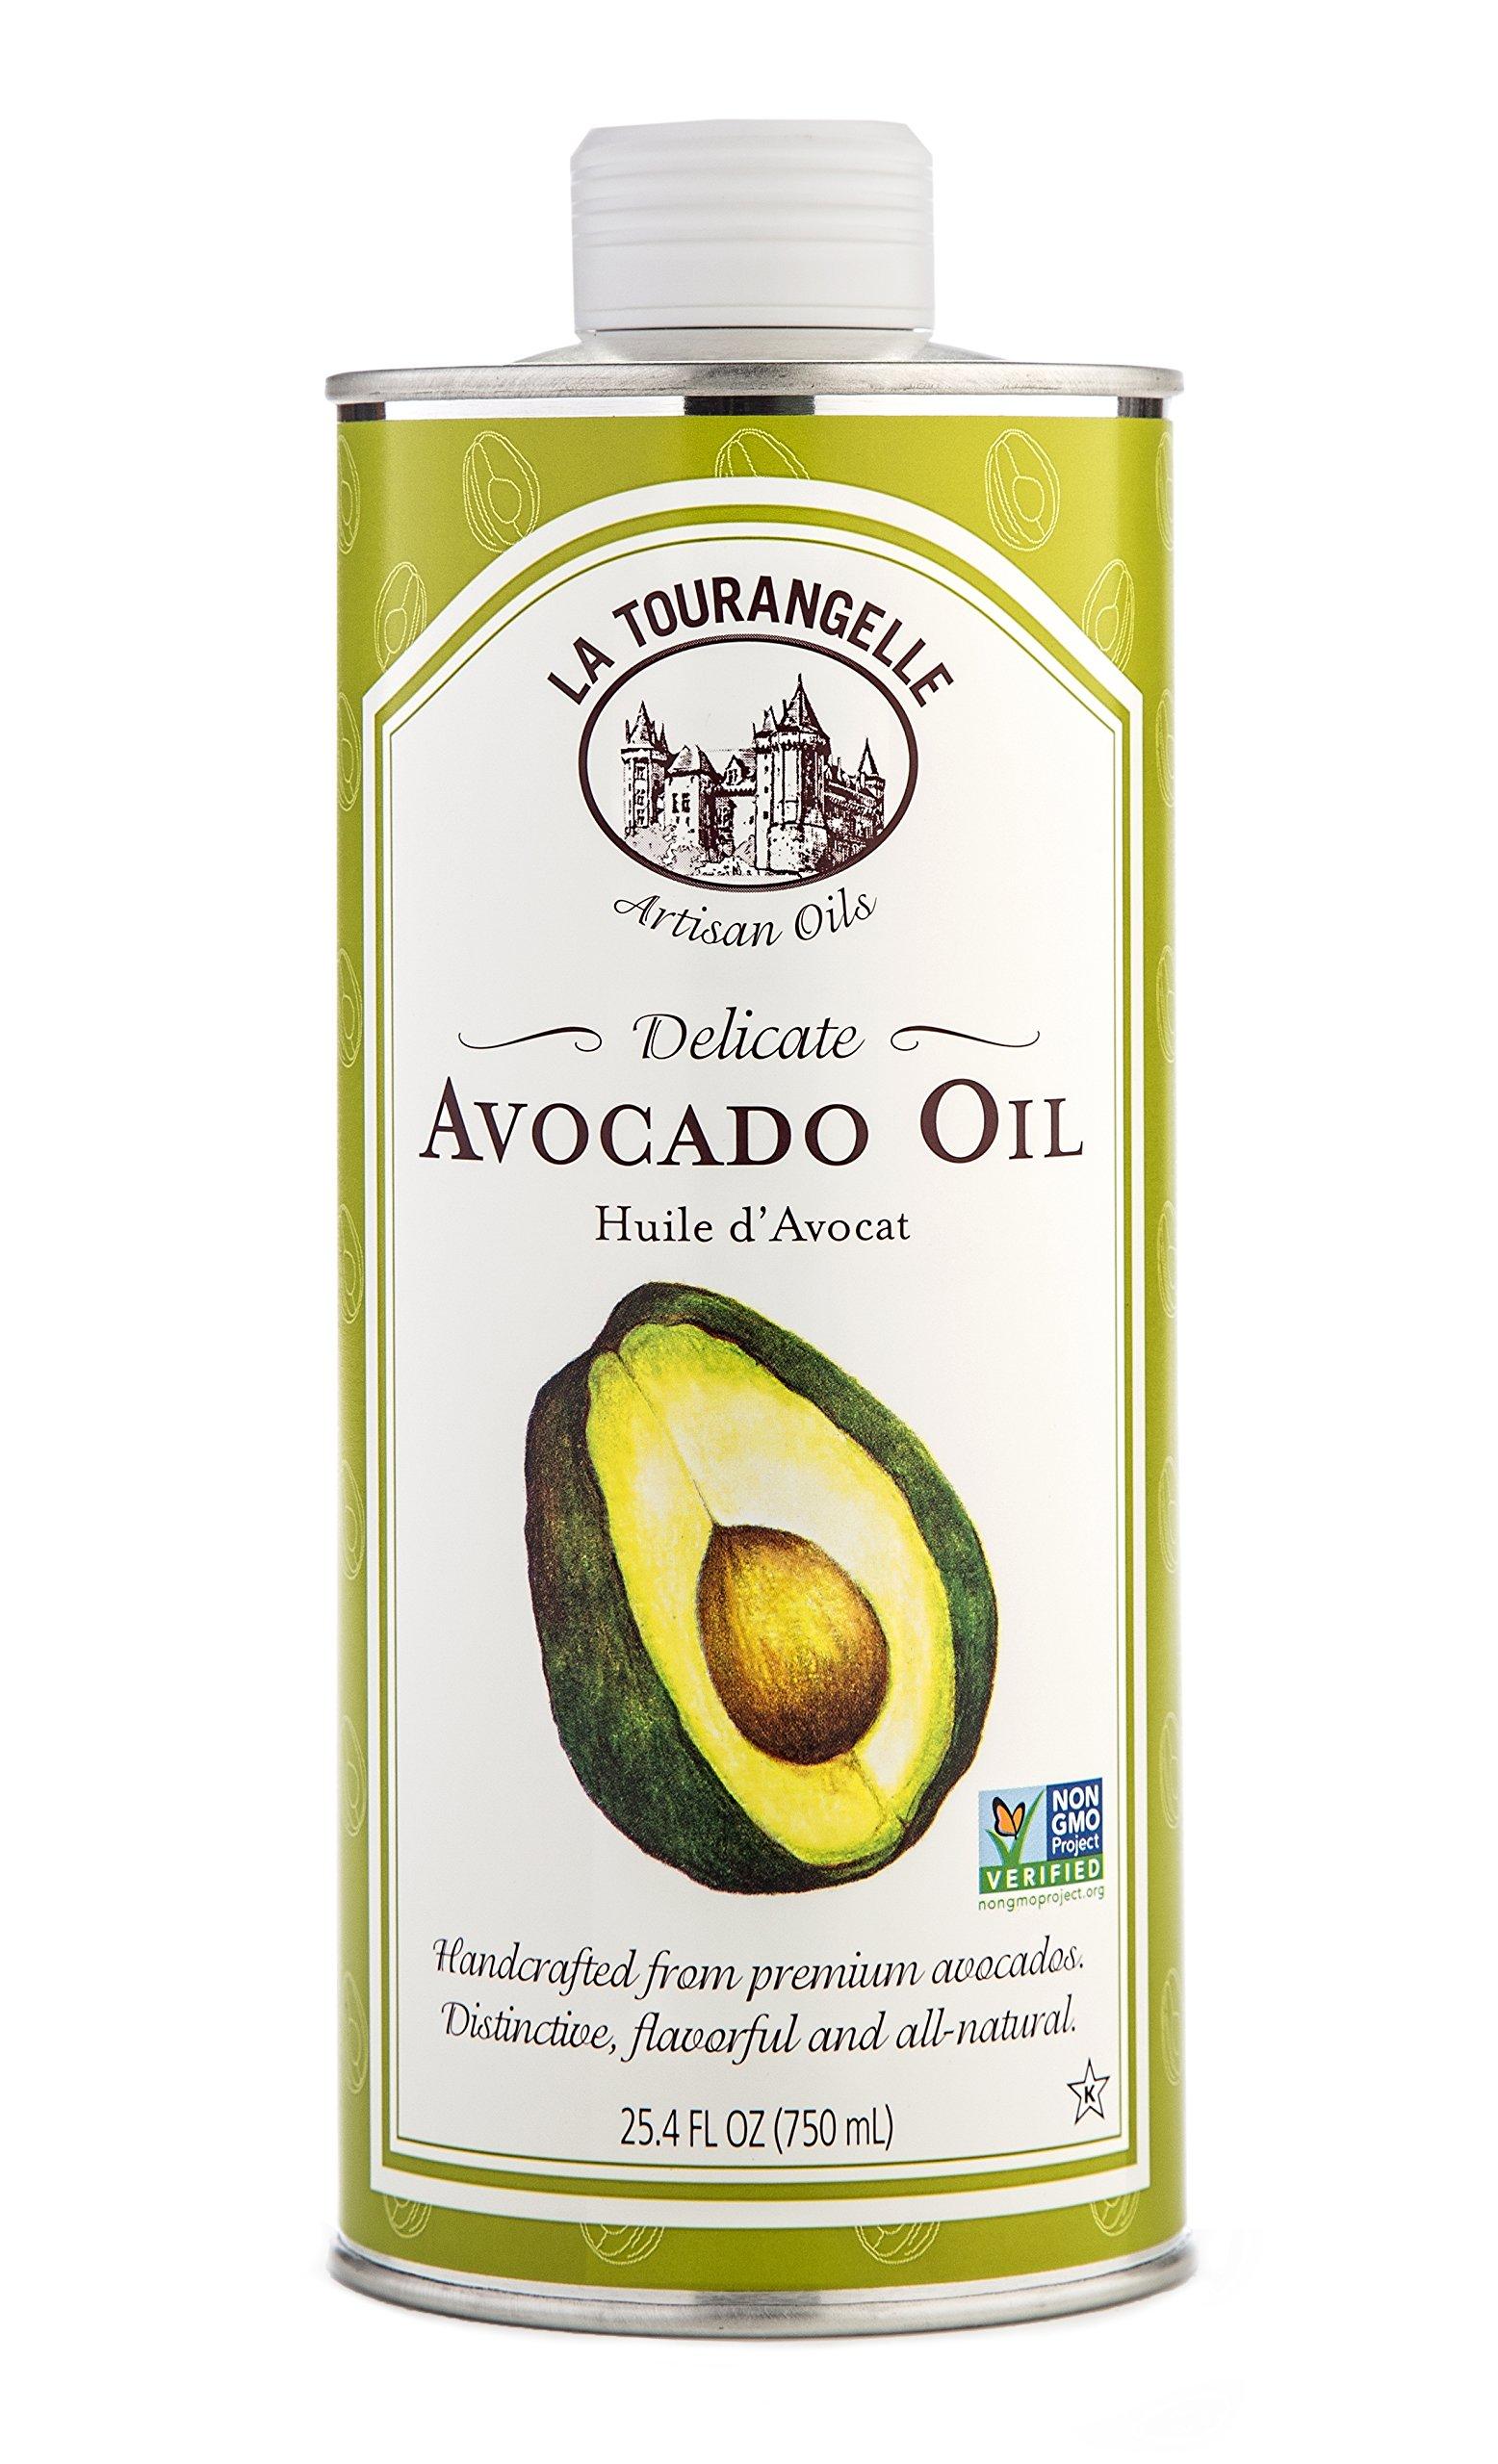 La Tourangelle Avocado Oil 25.4 Fl. Oz., All-Natural, Artisanal, Great for Salads, Fruit, Fish or Vegetables, Great Buttery Flavor by La Tourangelle